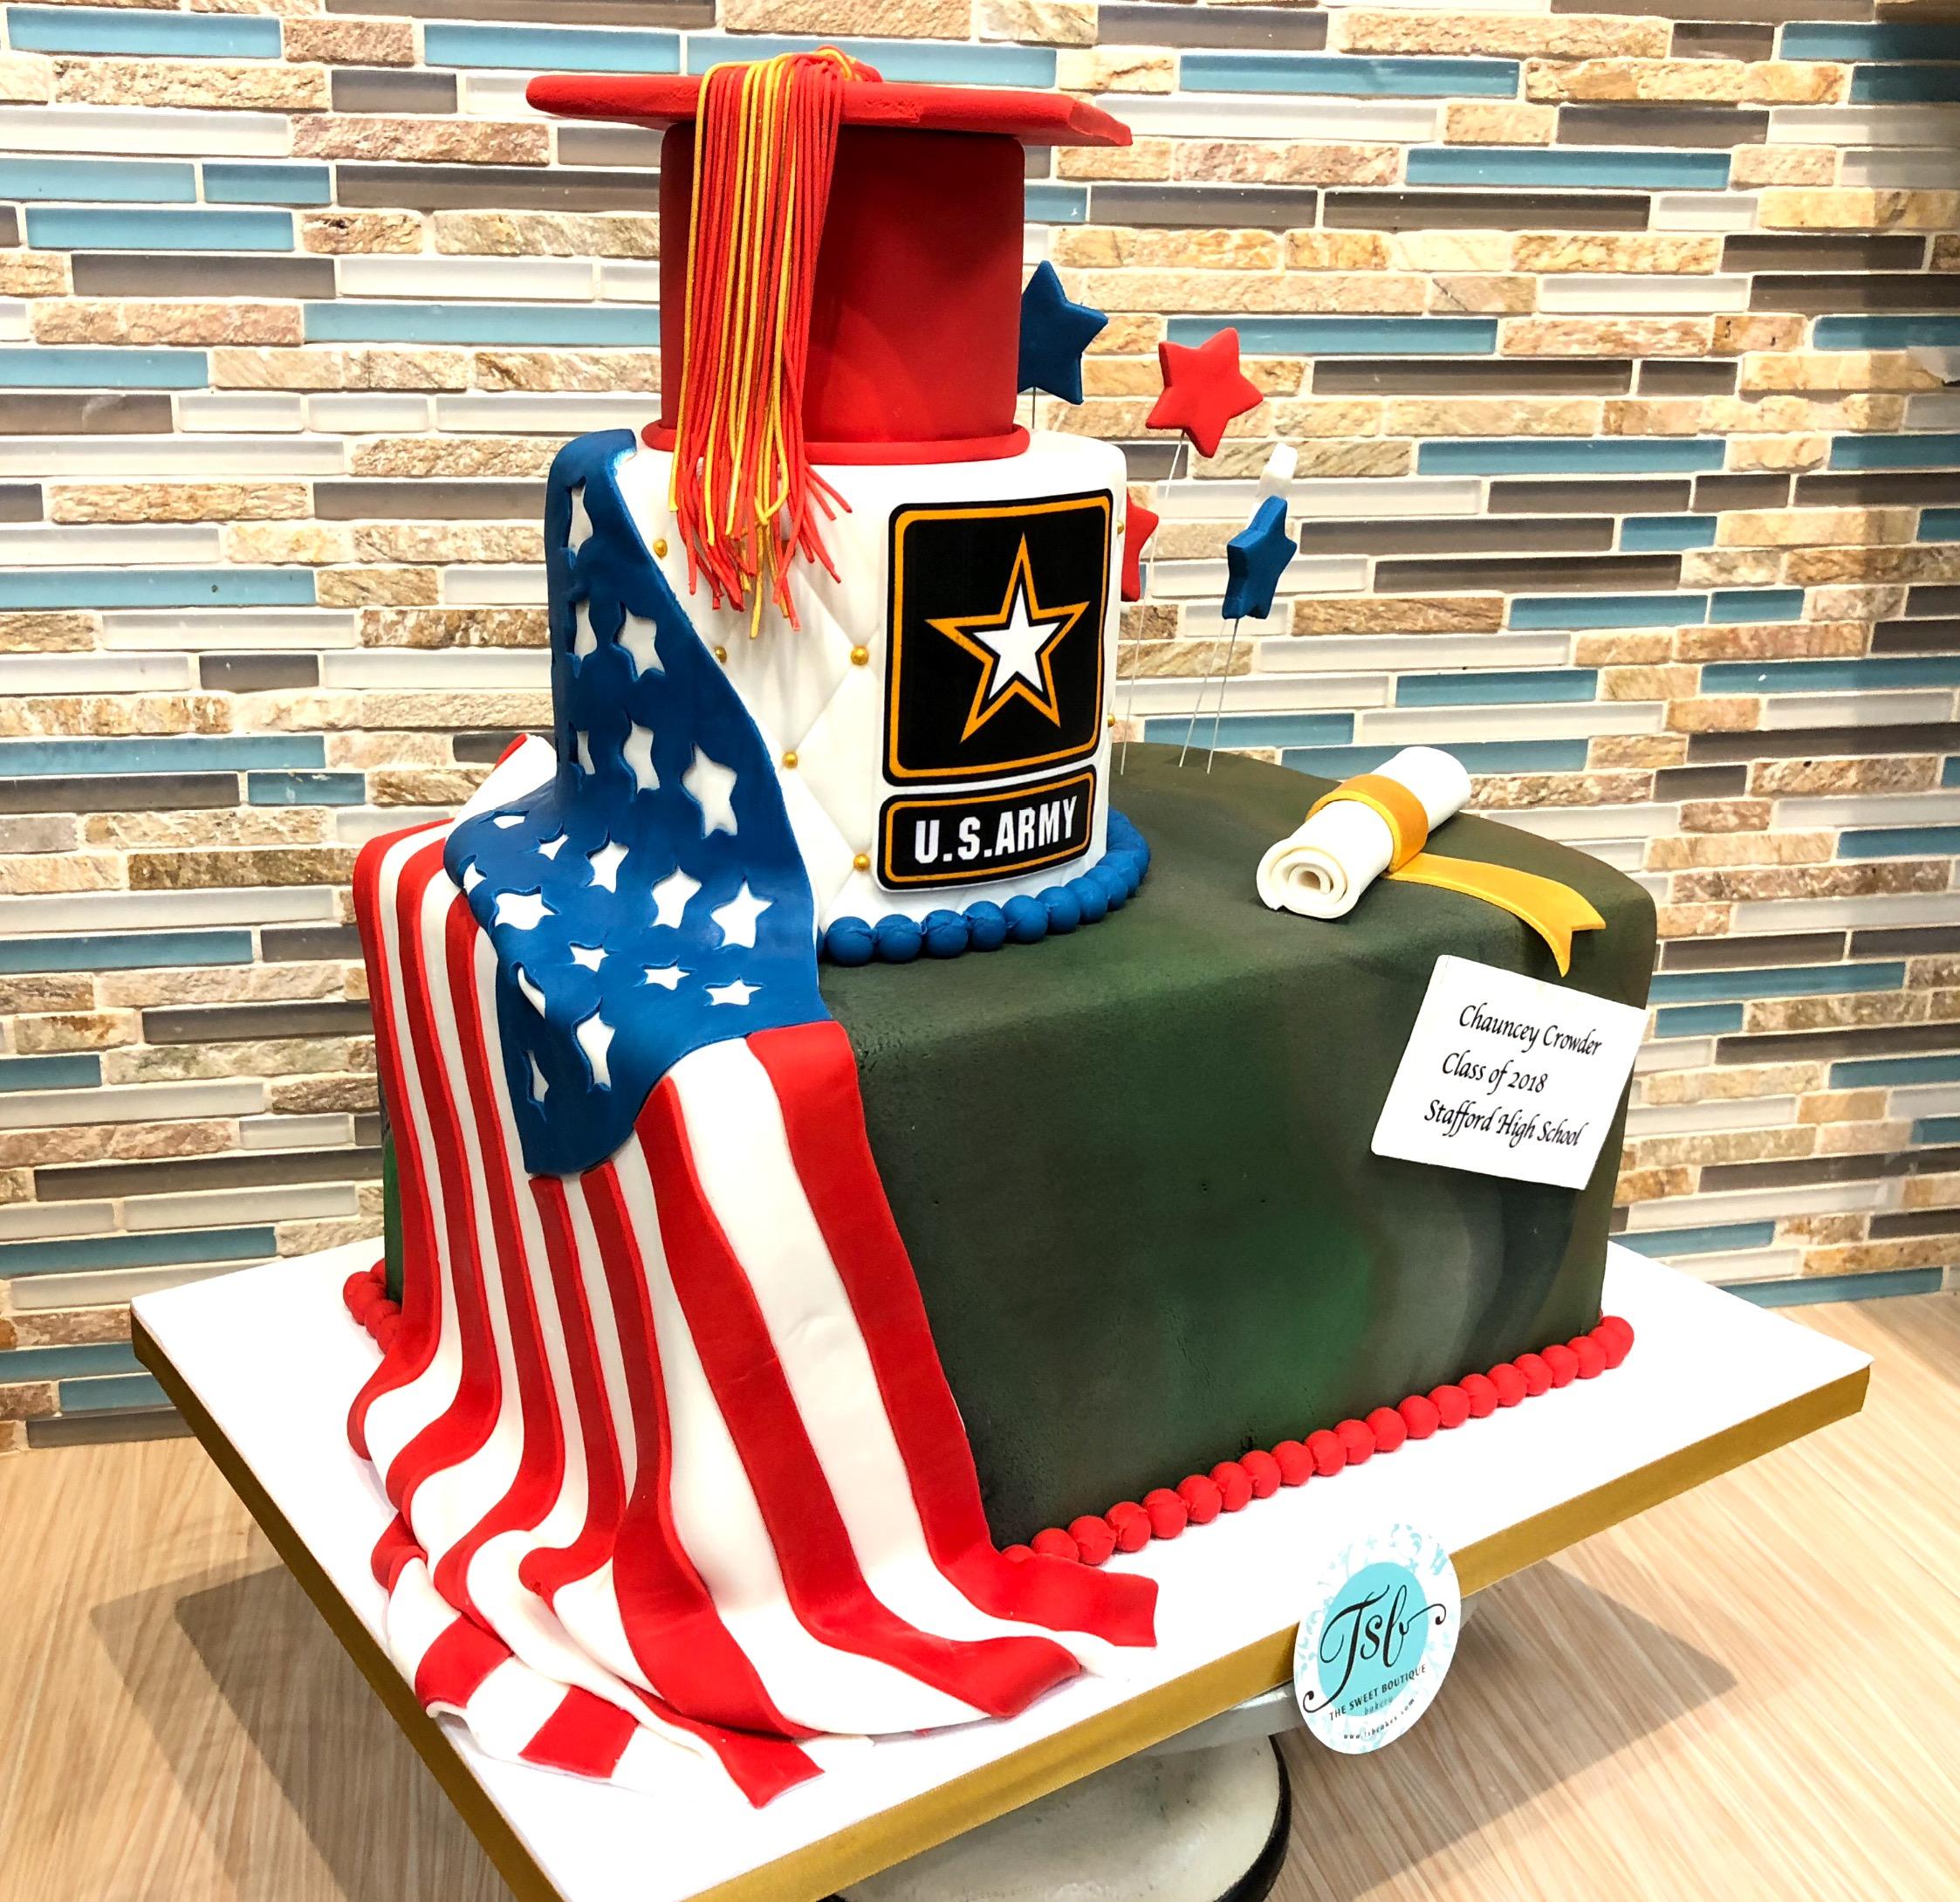 U.S. Army Graduation Cake